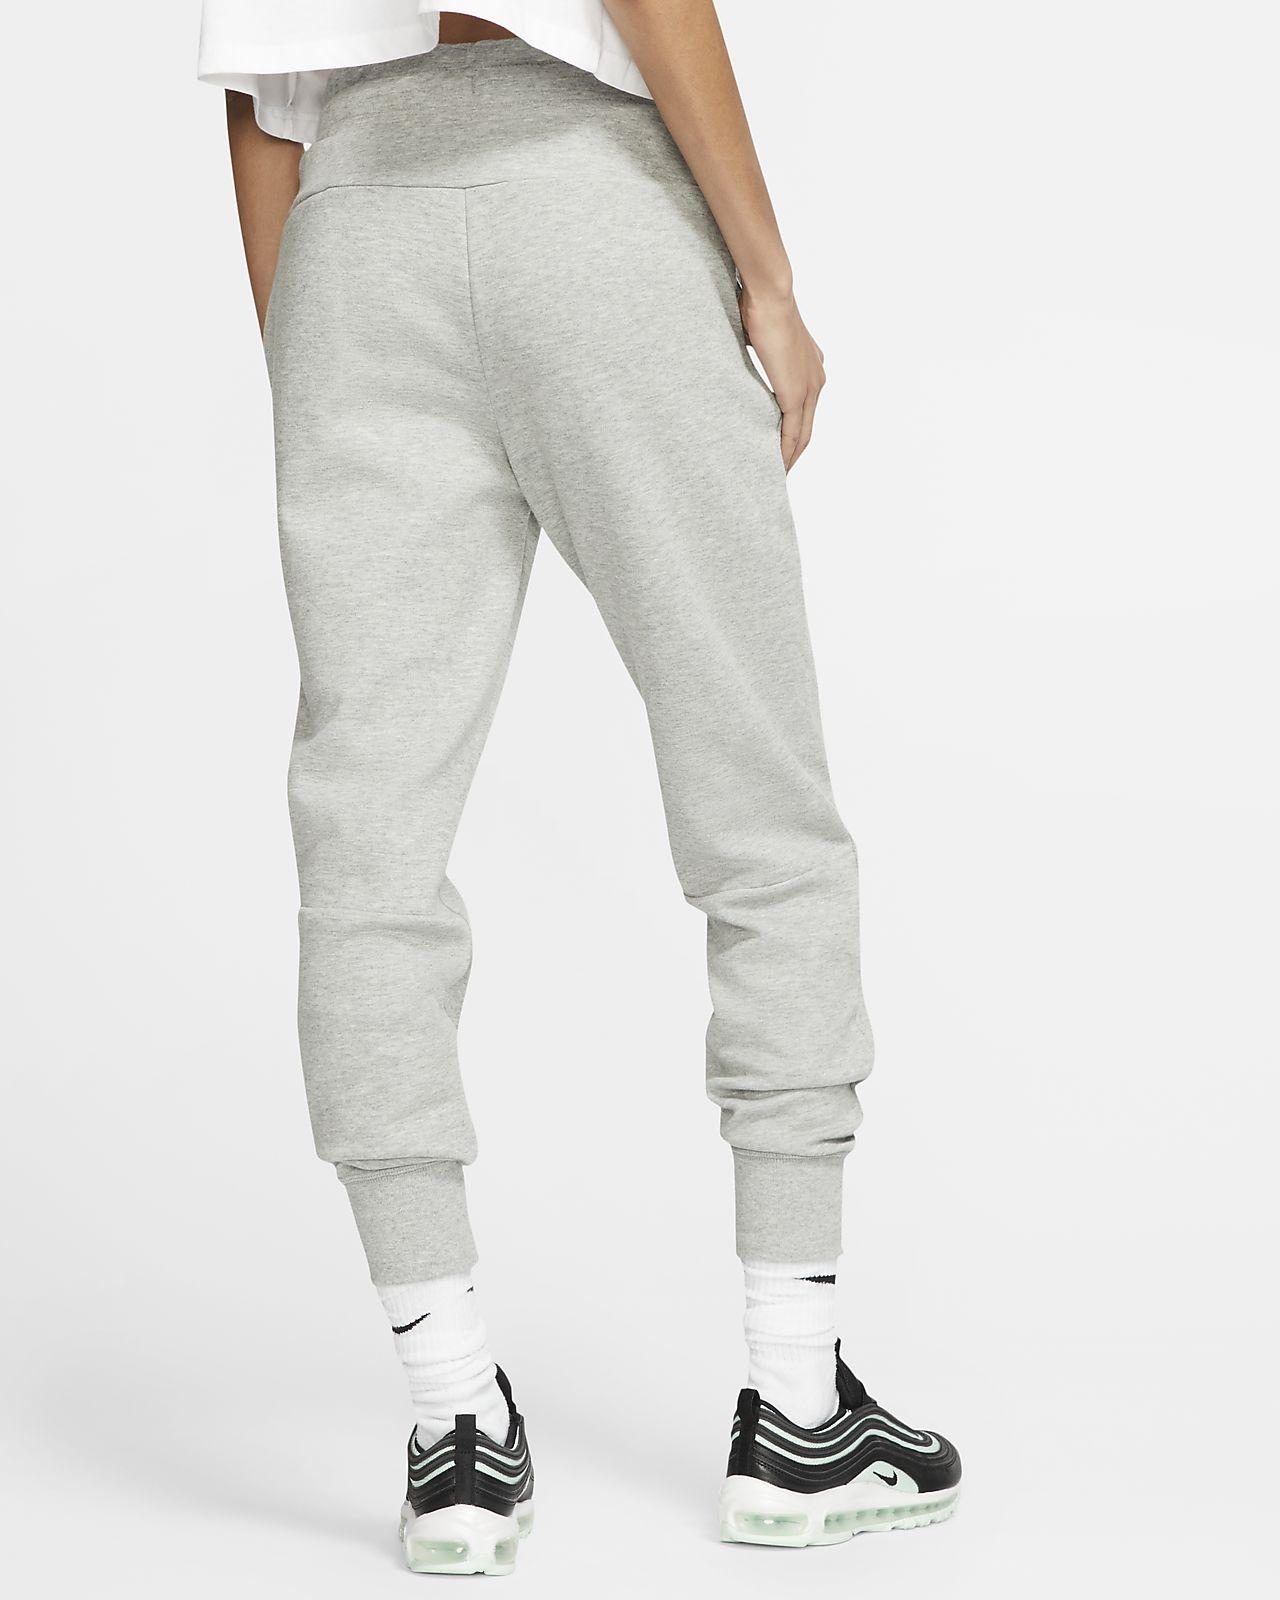 Nike Damen Tech Fleece | Damen Fleece